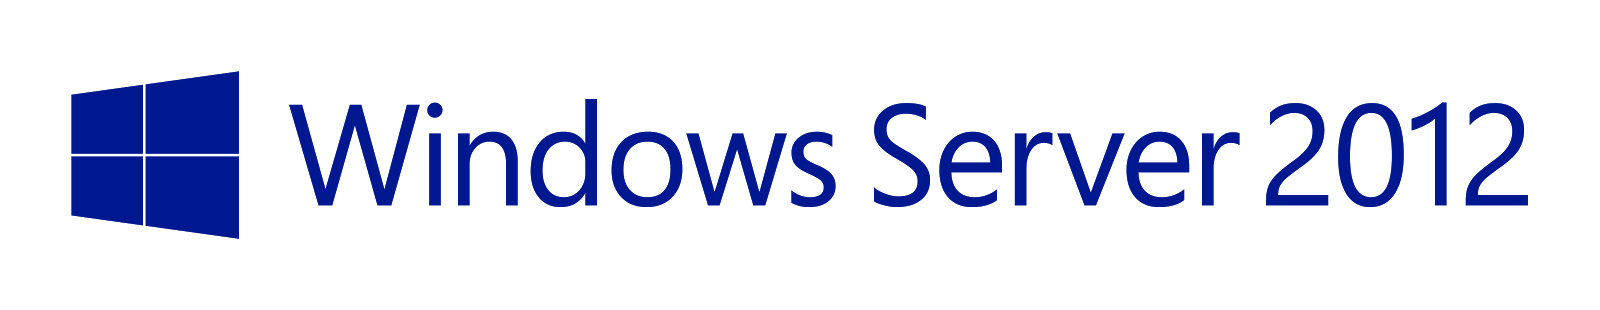 Description with windows server 2012 microsoft is a server platform